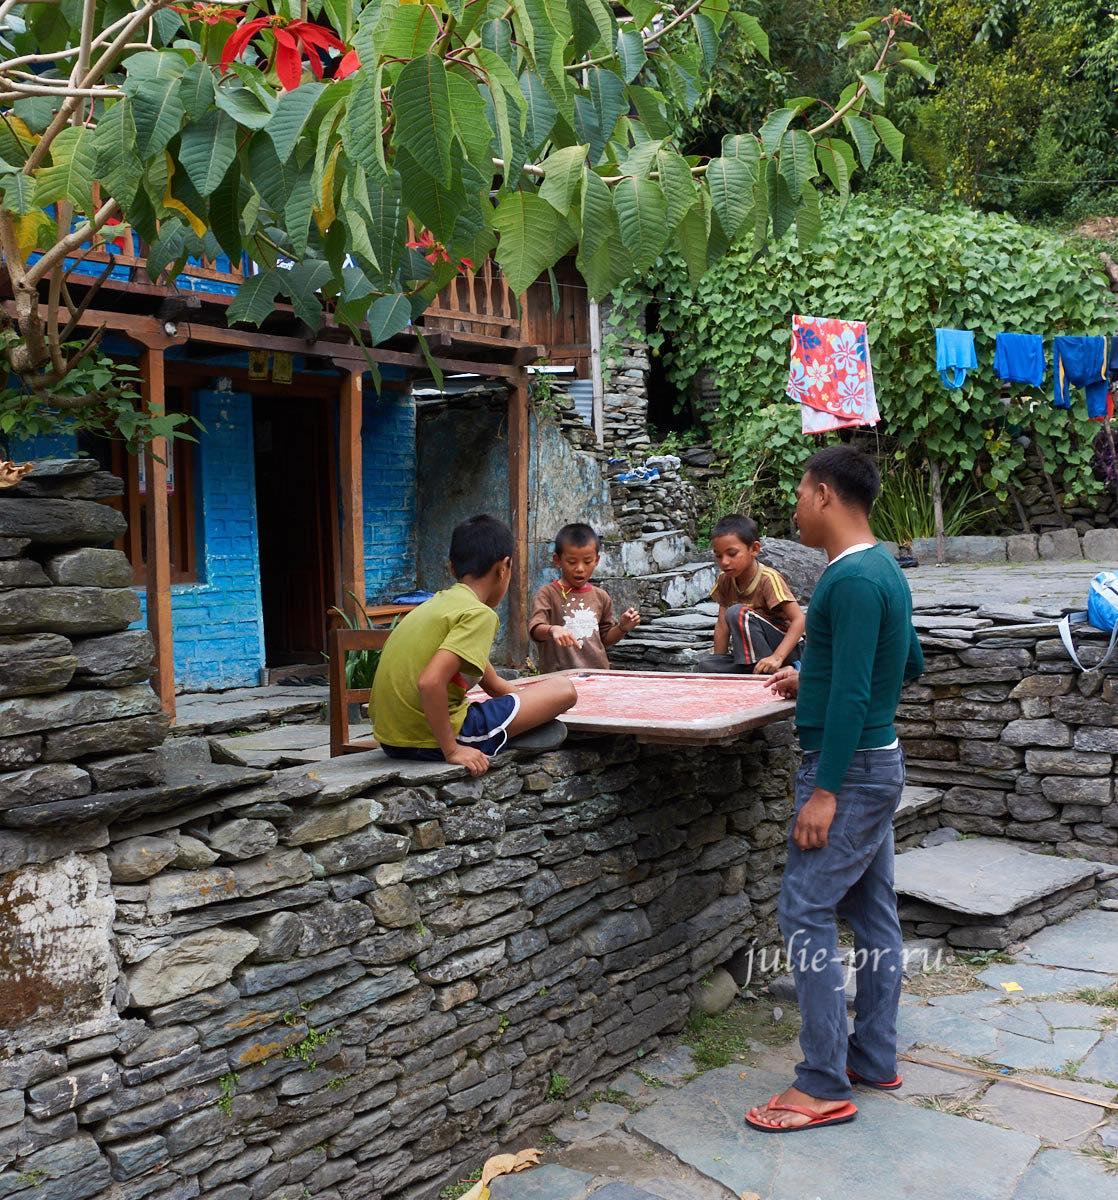 Непал, Пун-Хилл трек, Деревня Биретанти, Игра в карром